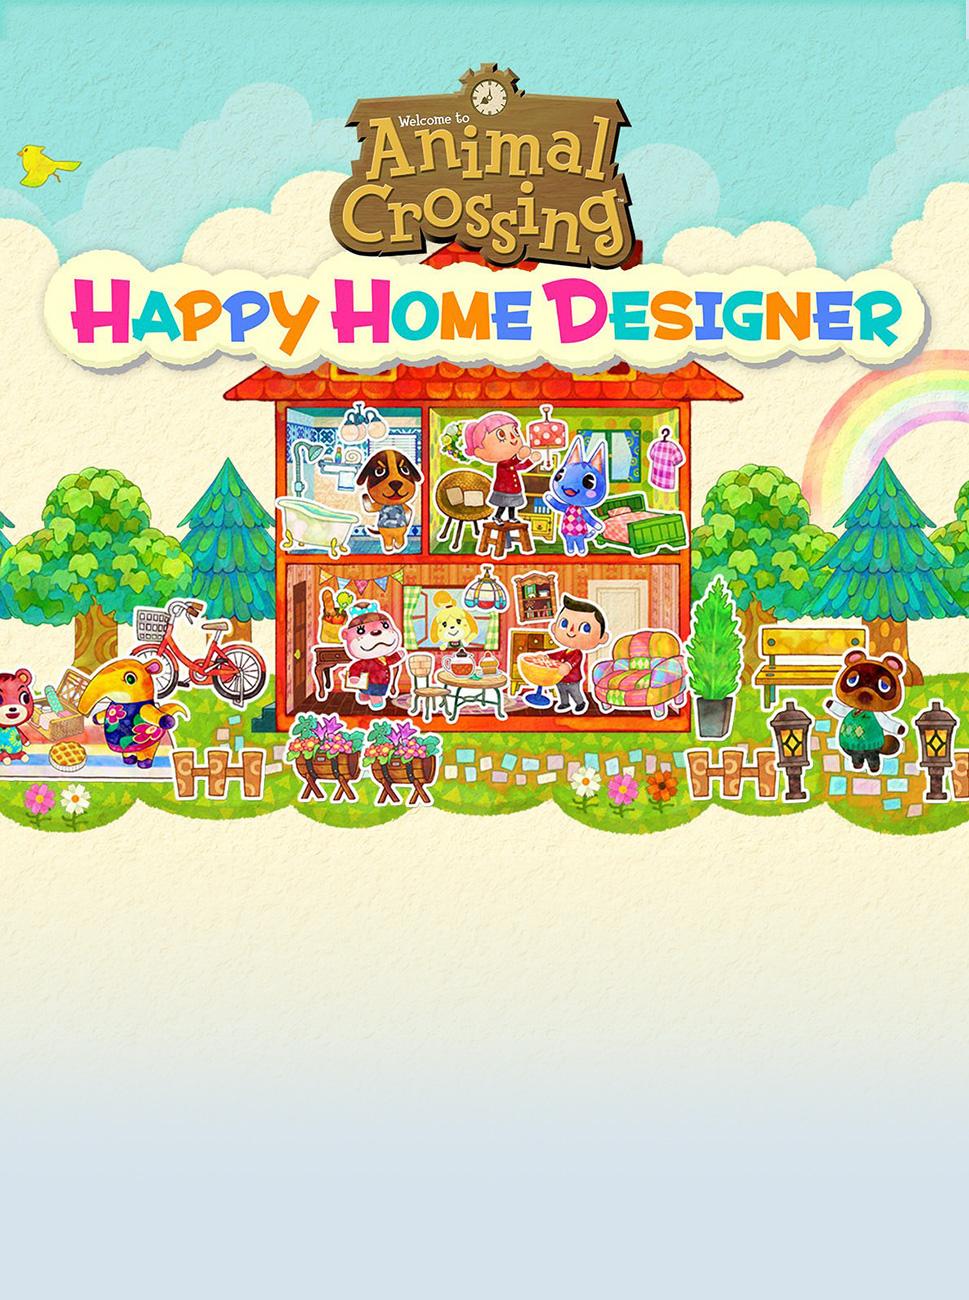 Animal crossing happy home designer for Mobilia webhallen